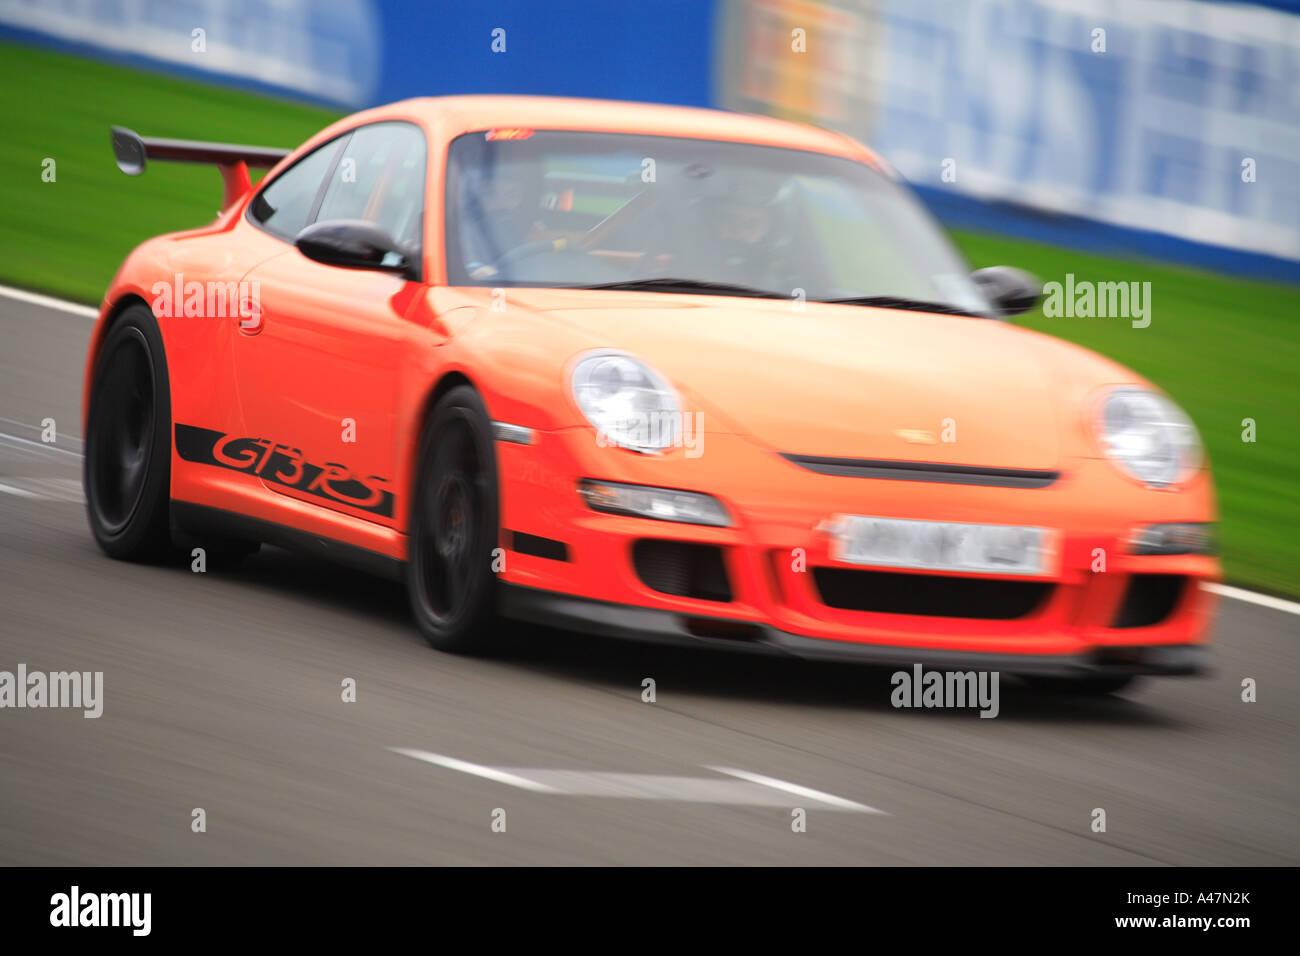 Porsche GT3 RS track race car orange fast speed motor sport racing ...